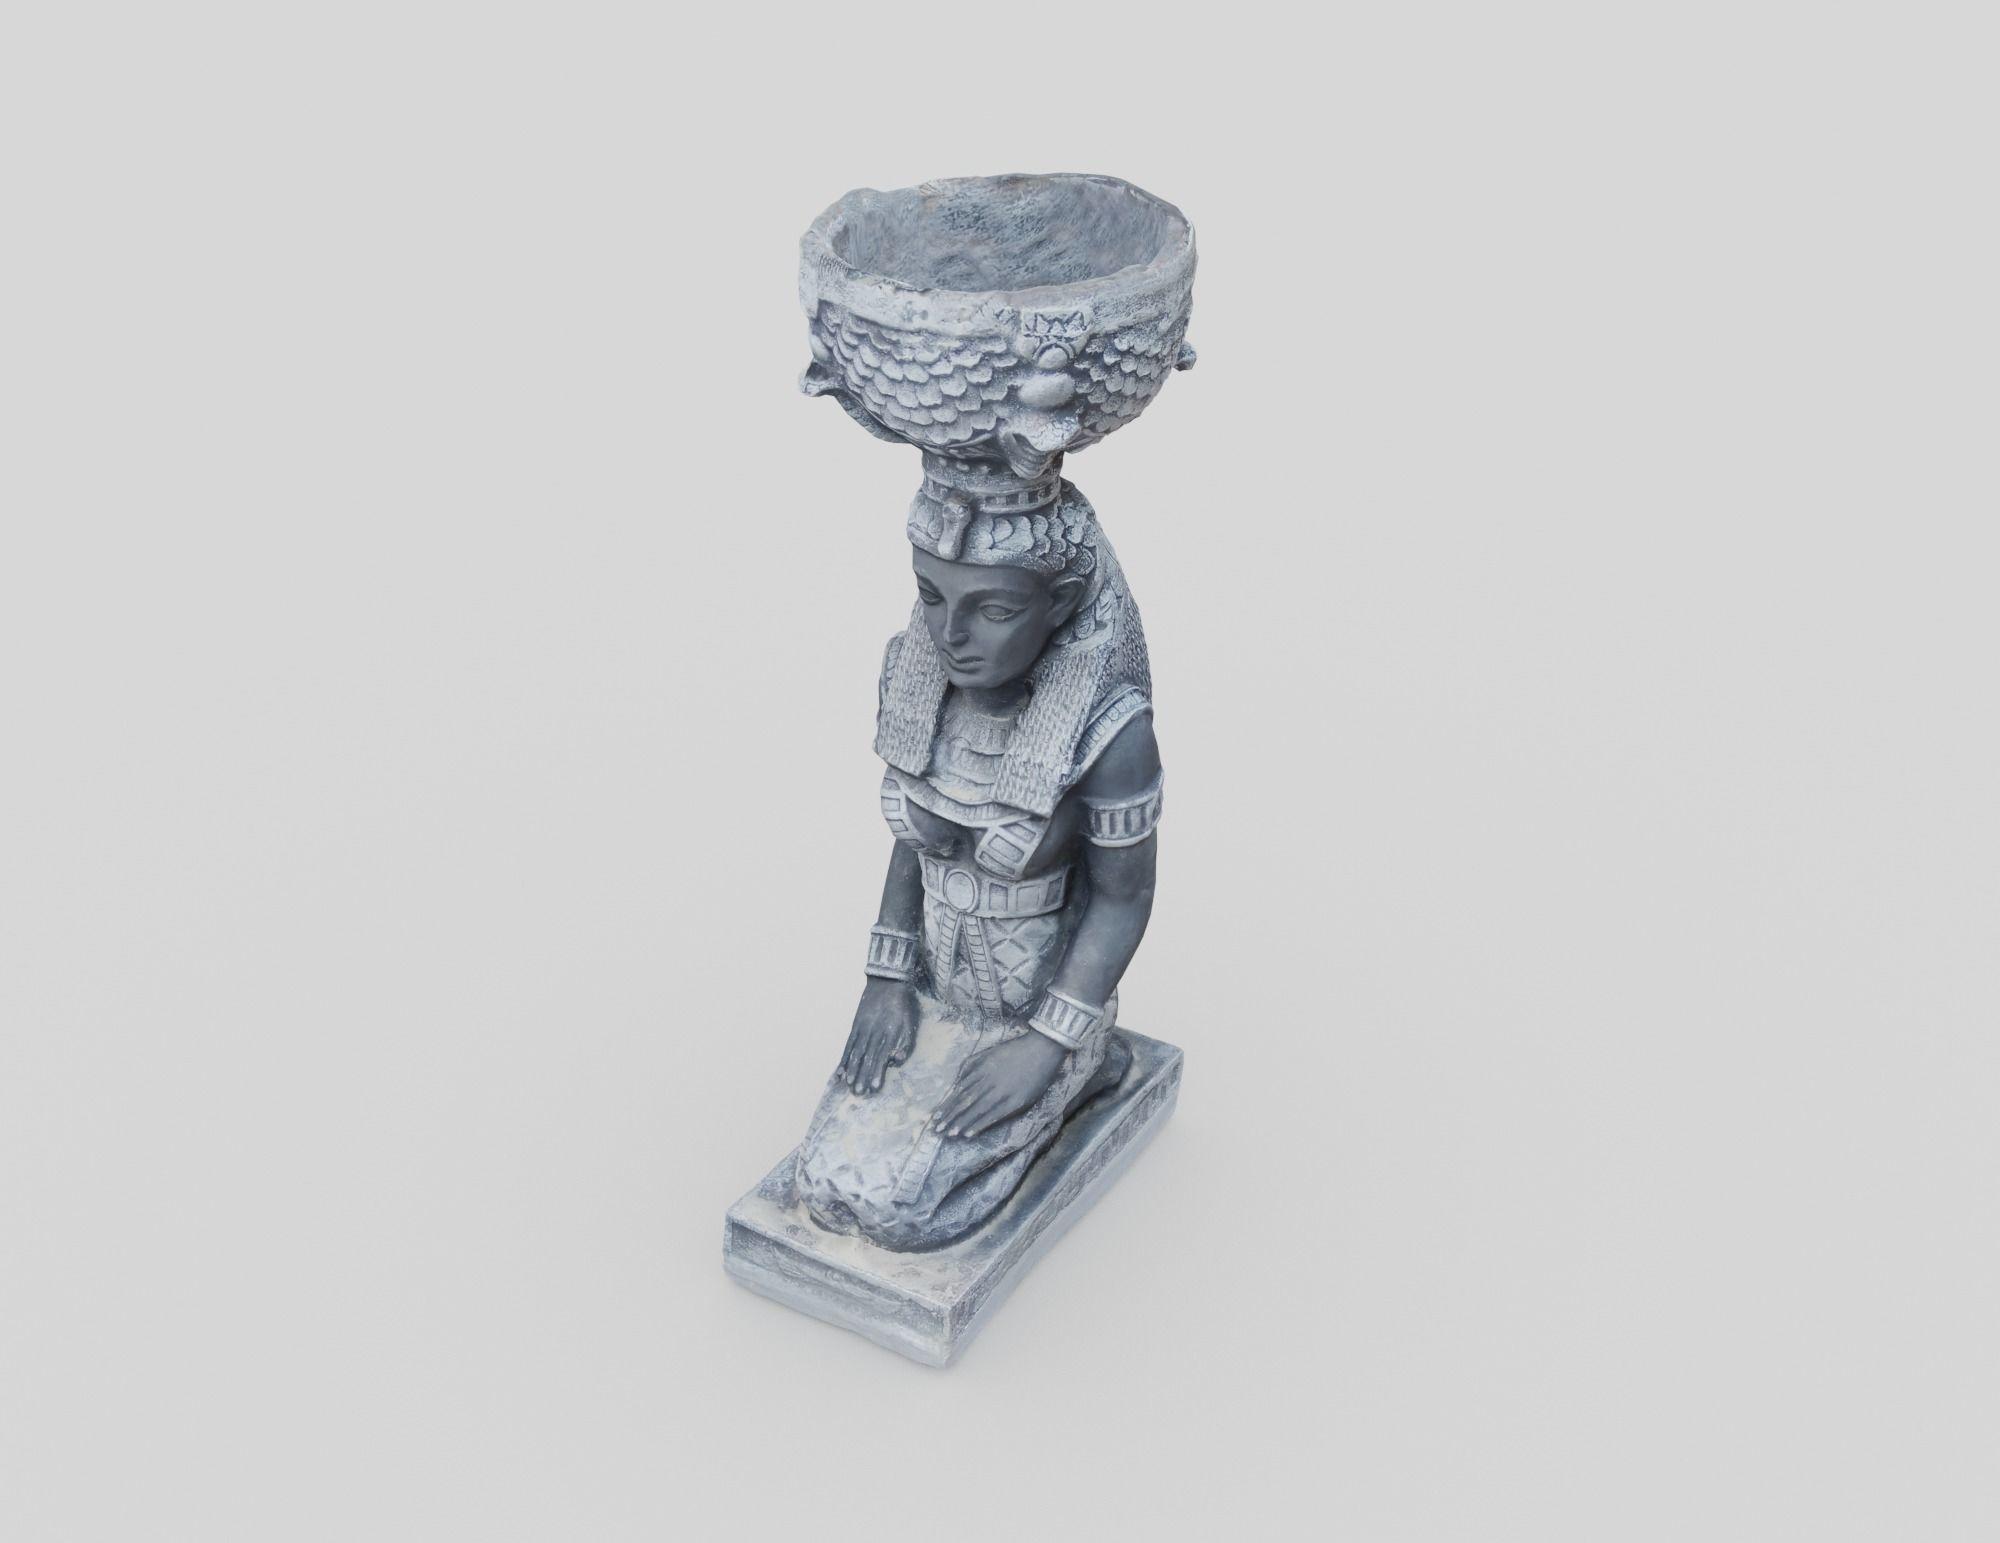 Old Egypt Sculpture